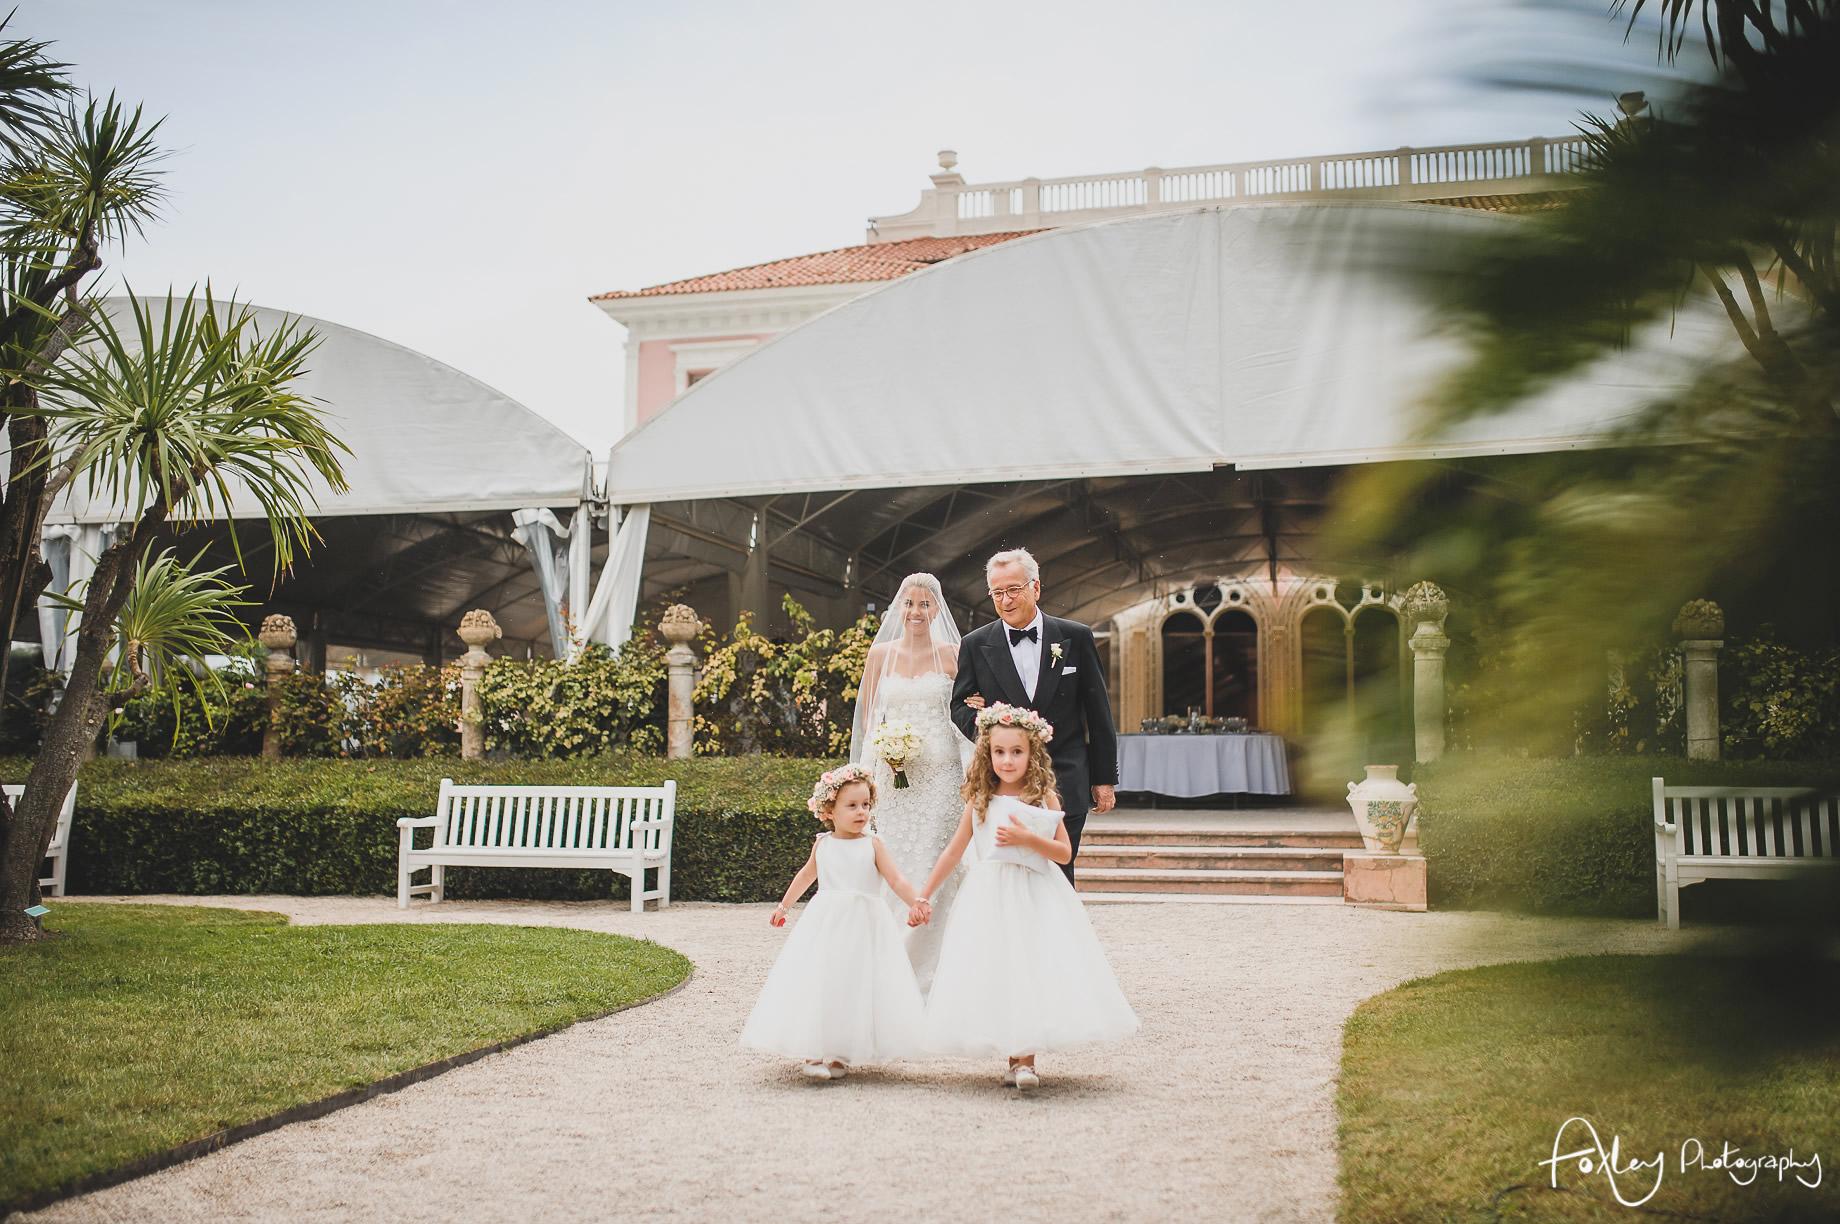 Jil and Will's Wedding at Villa Ephrussi De Rothschild 090